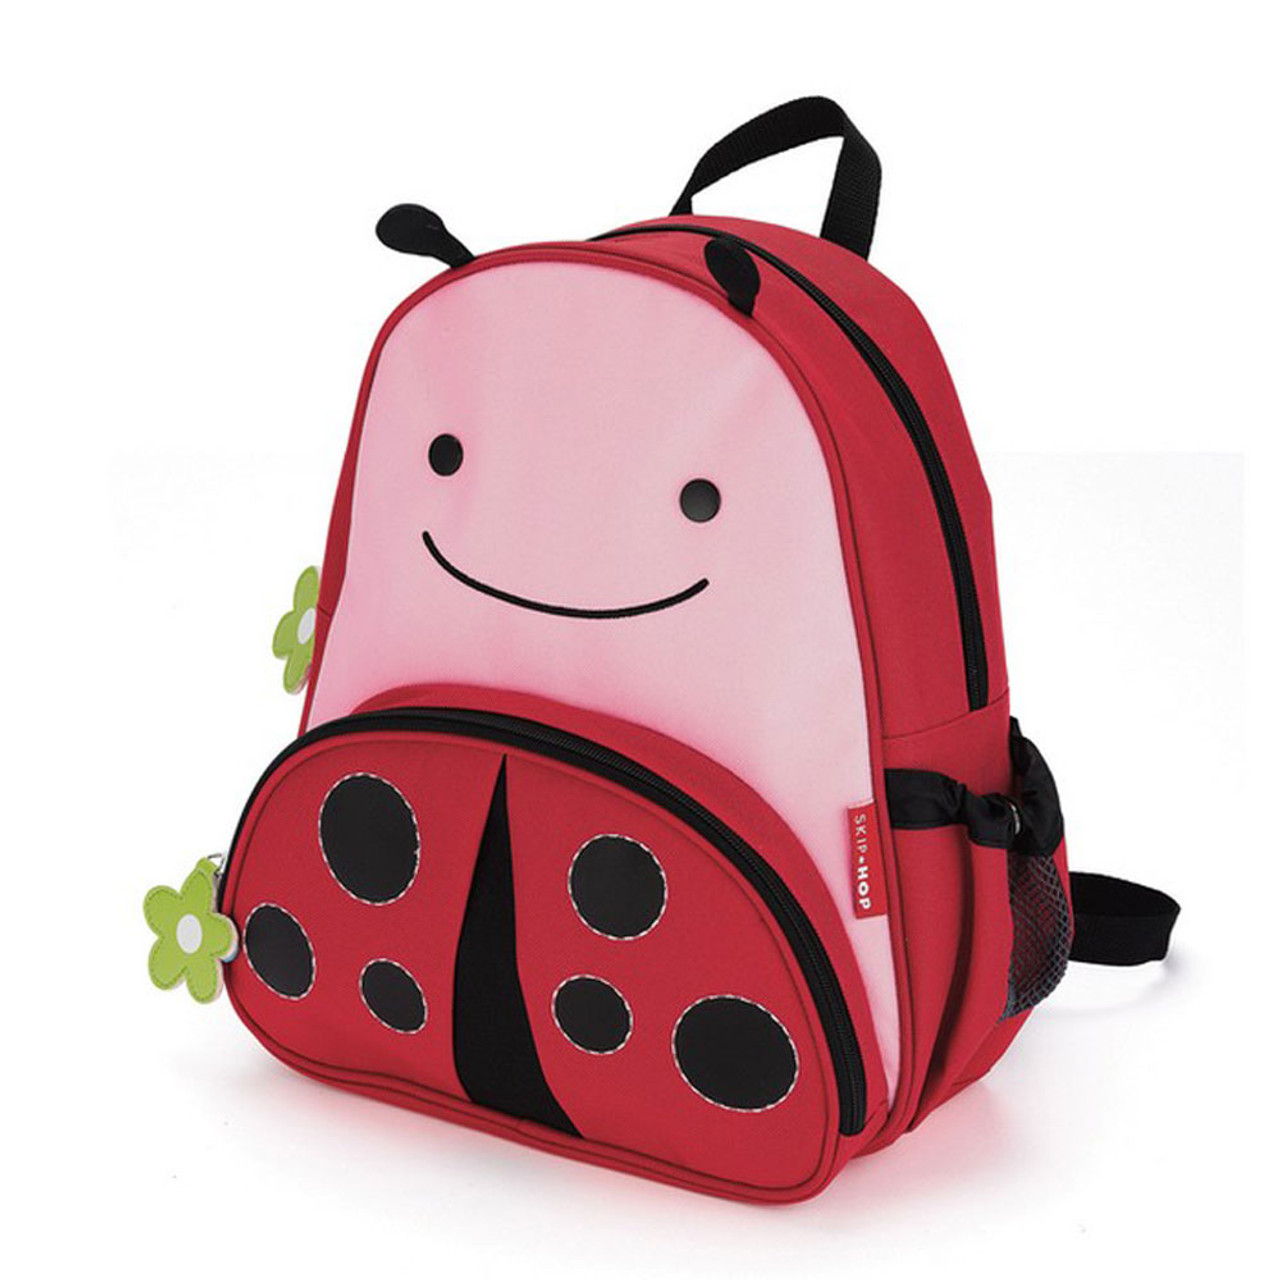 Skip Hop Ladybug Zoo Backpack - Buy Toddler & Kids Bags Online